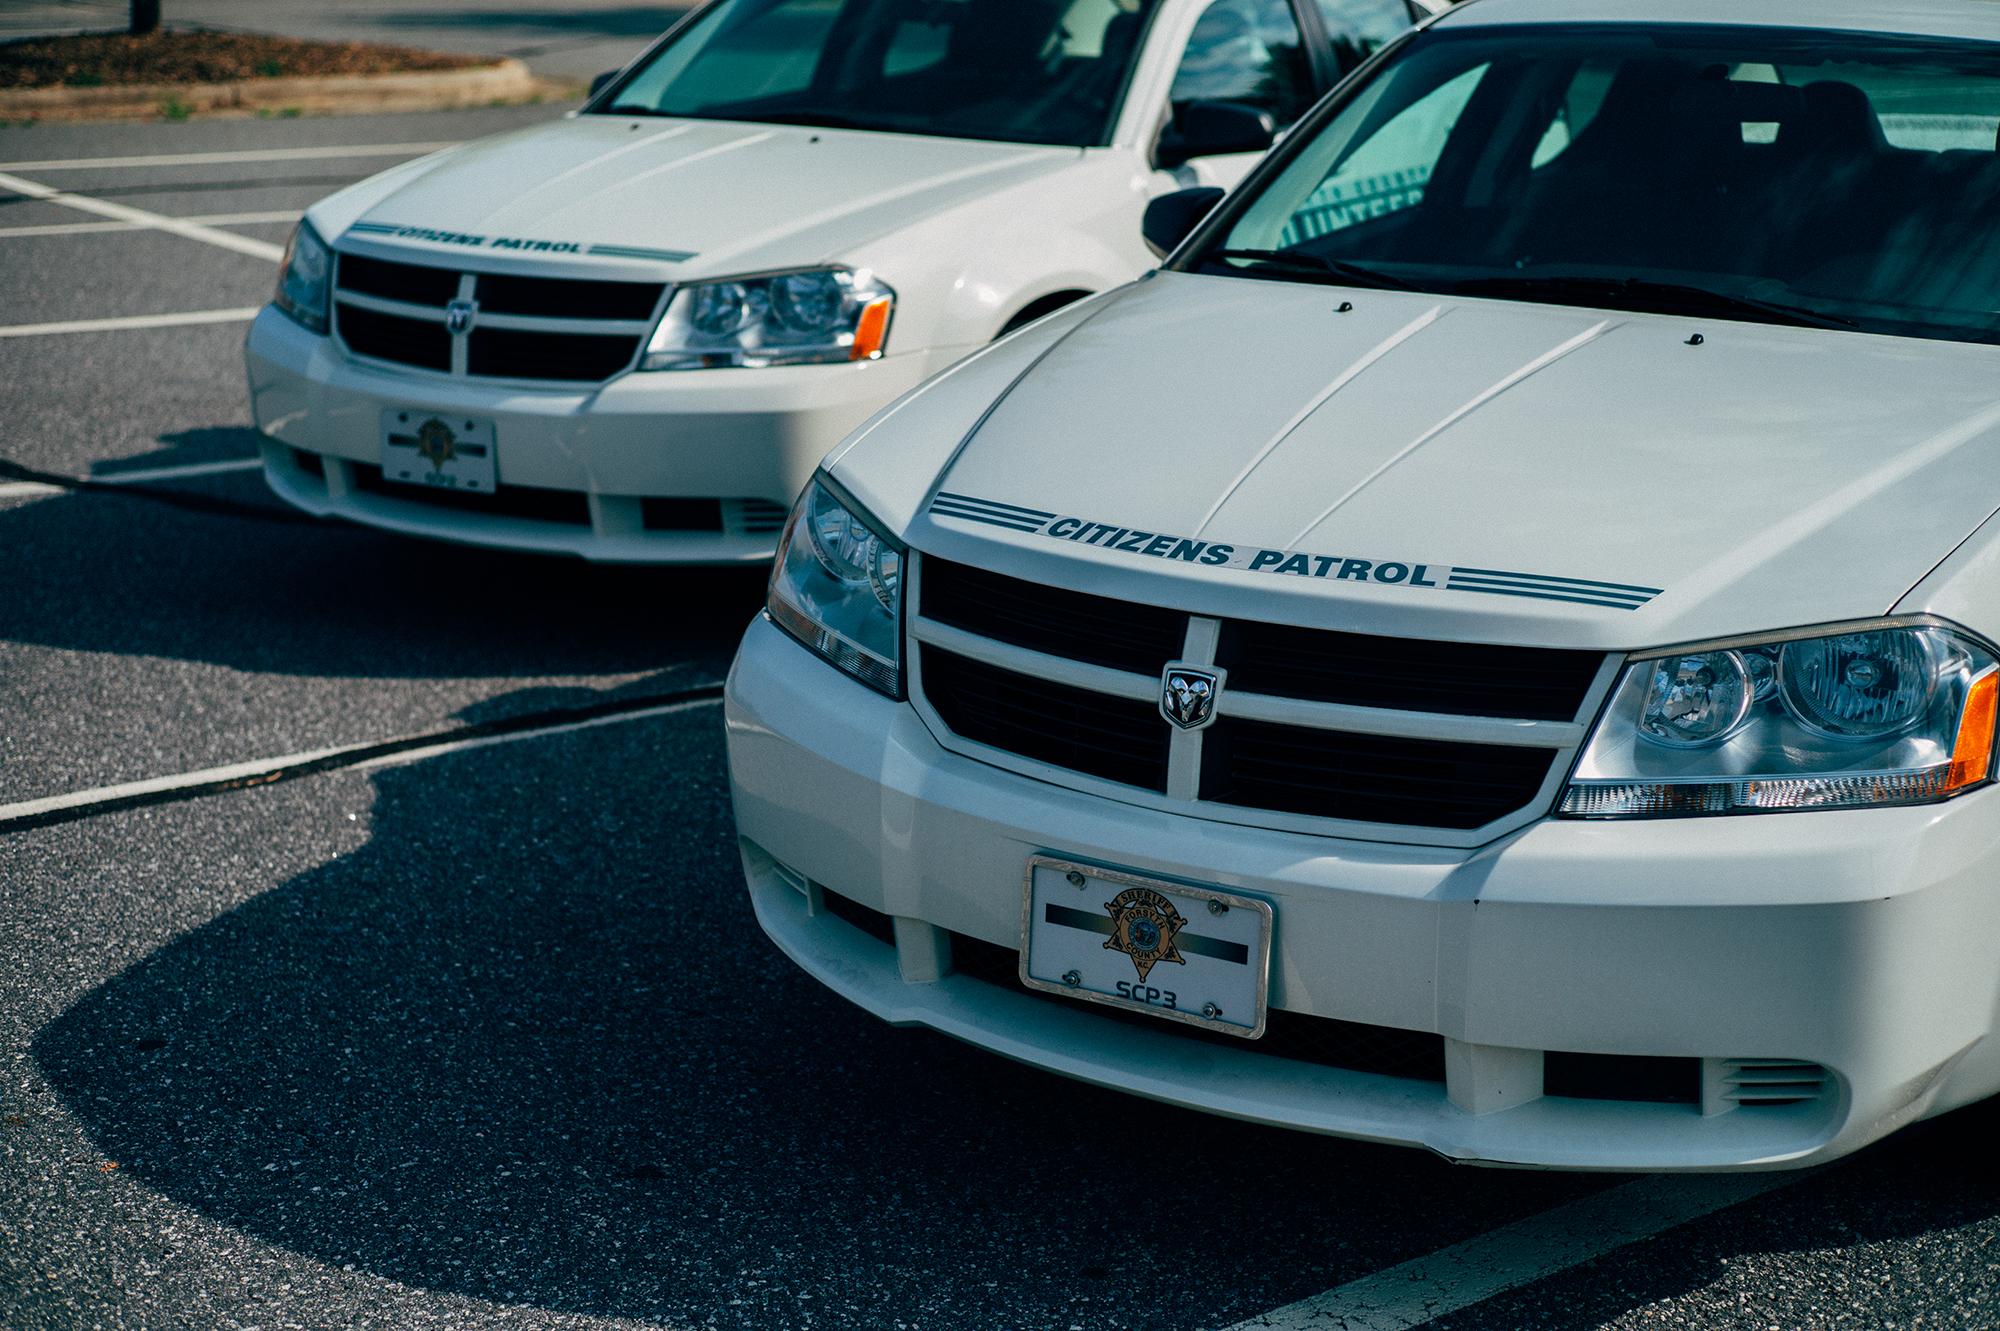 Sheriff's Citizens Patrol